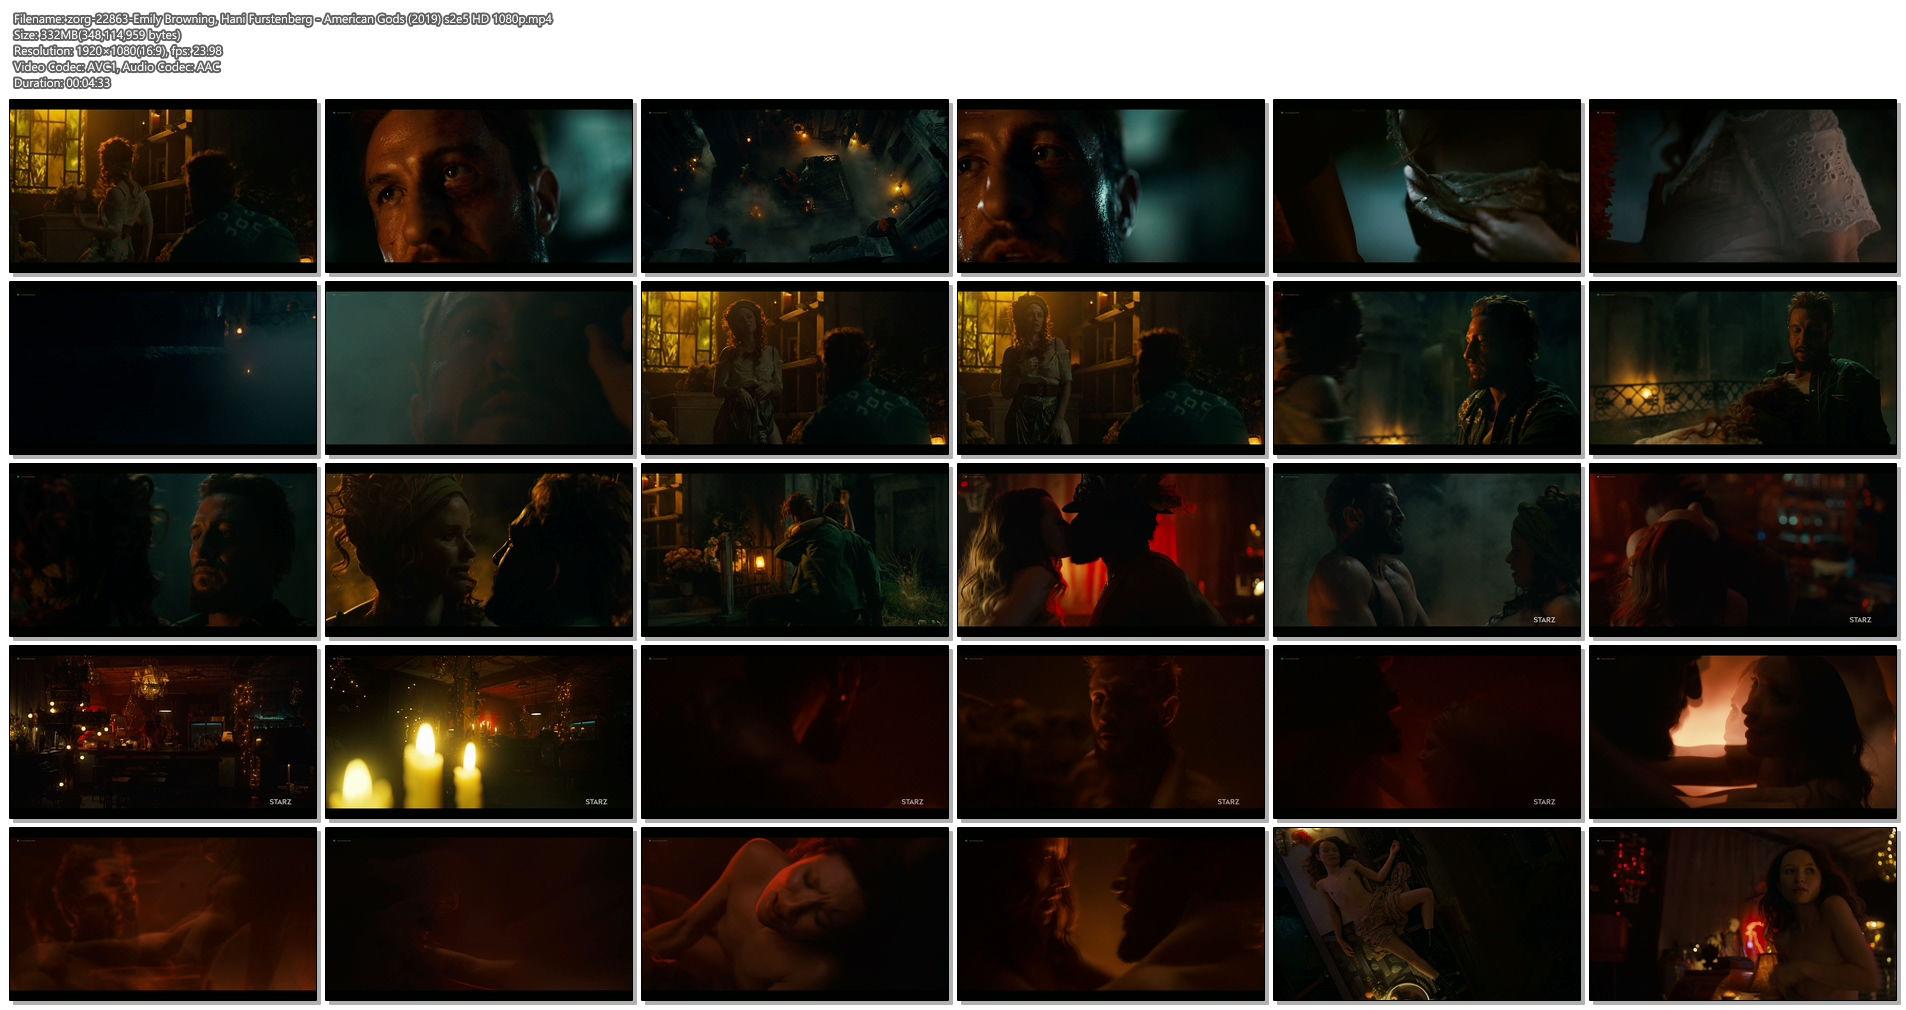 Emily Browning nude hot sex Hani Furstenberg nude sex too - American Gods (2019) s2e5 HD 1080p (1)